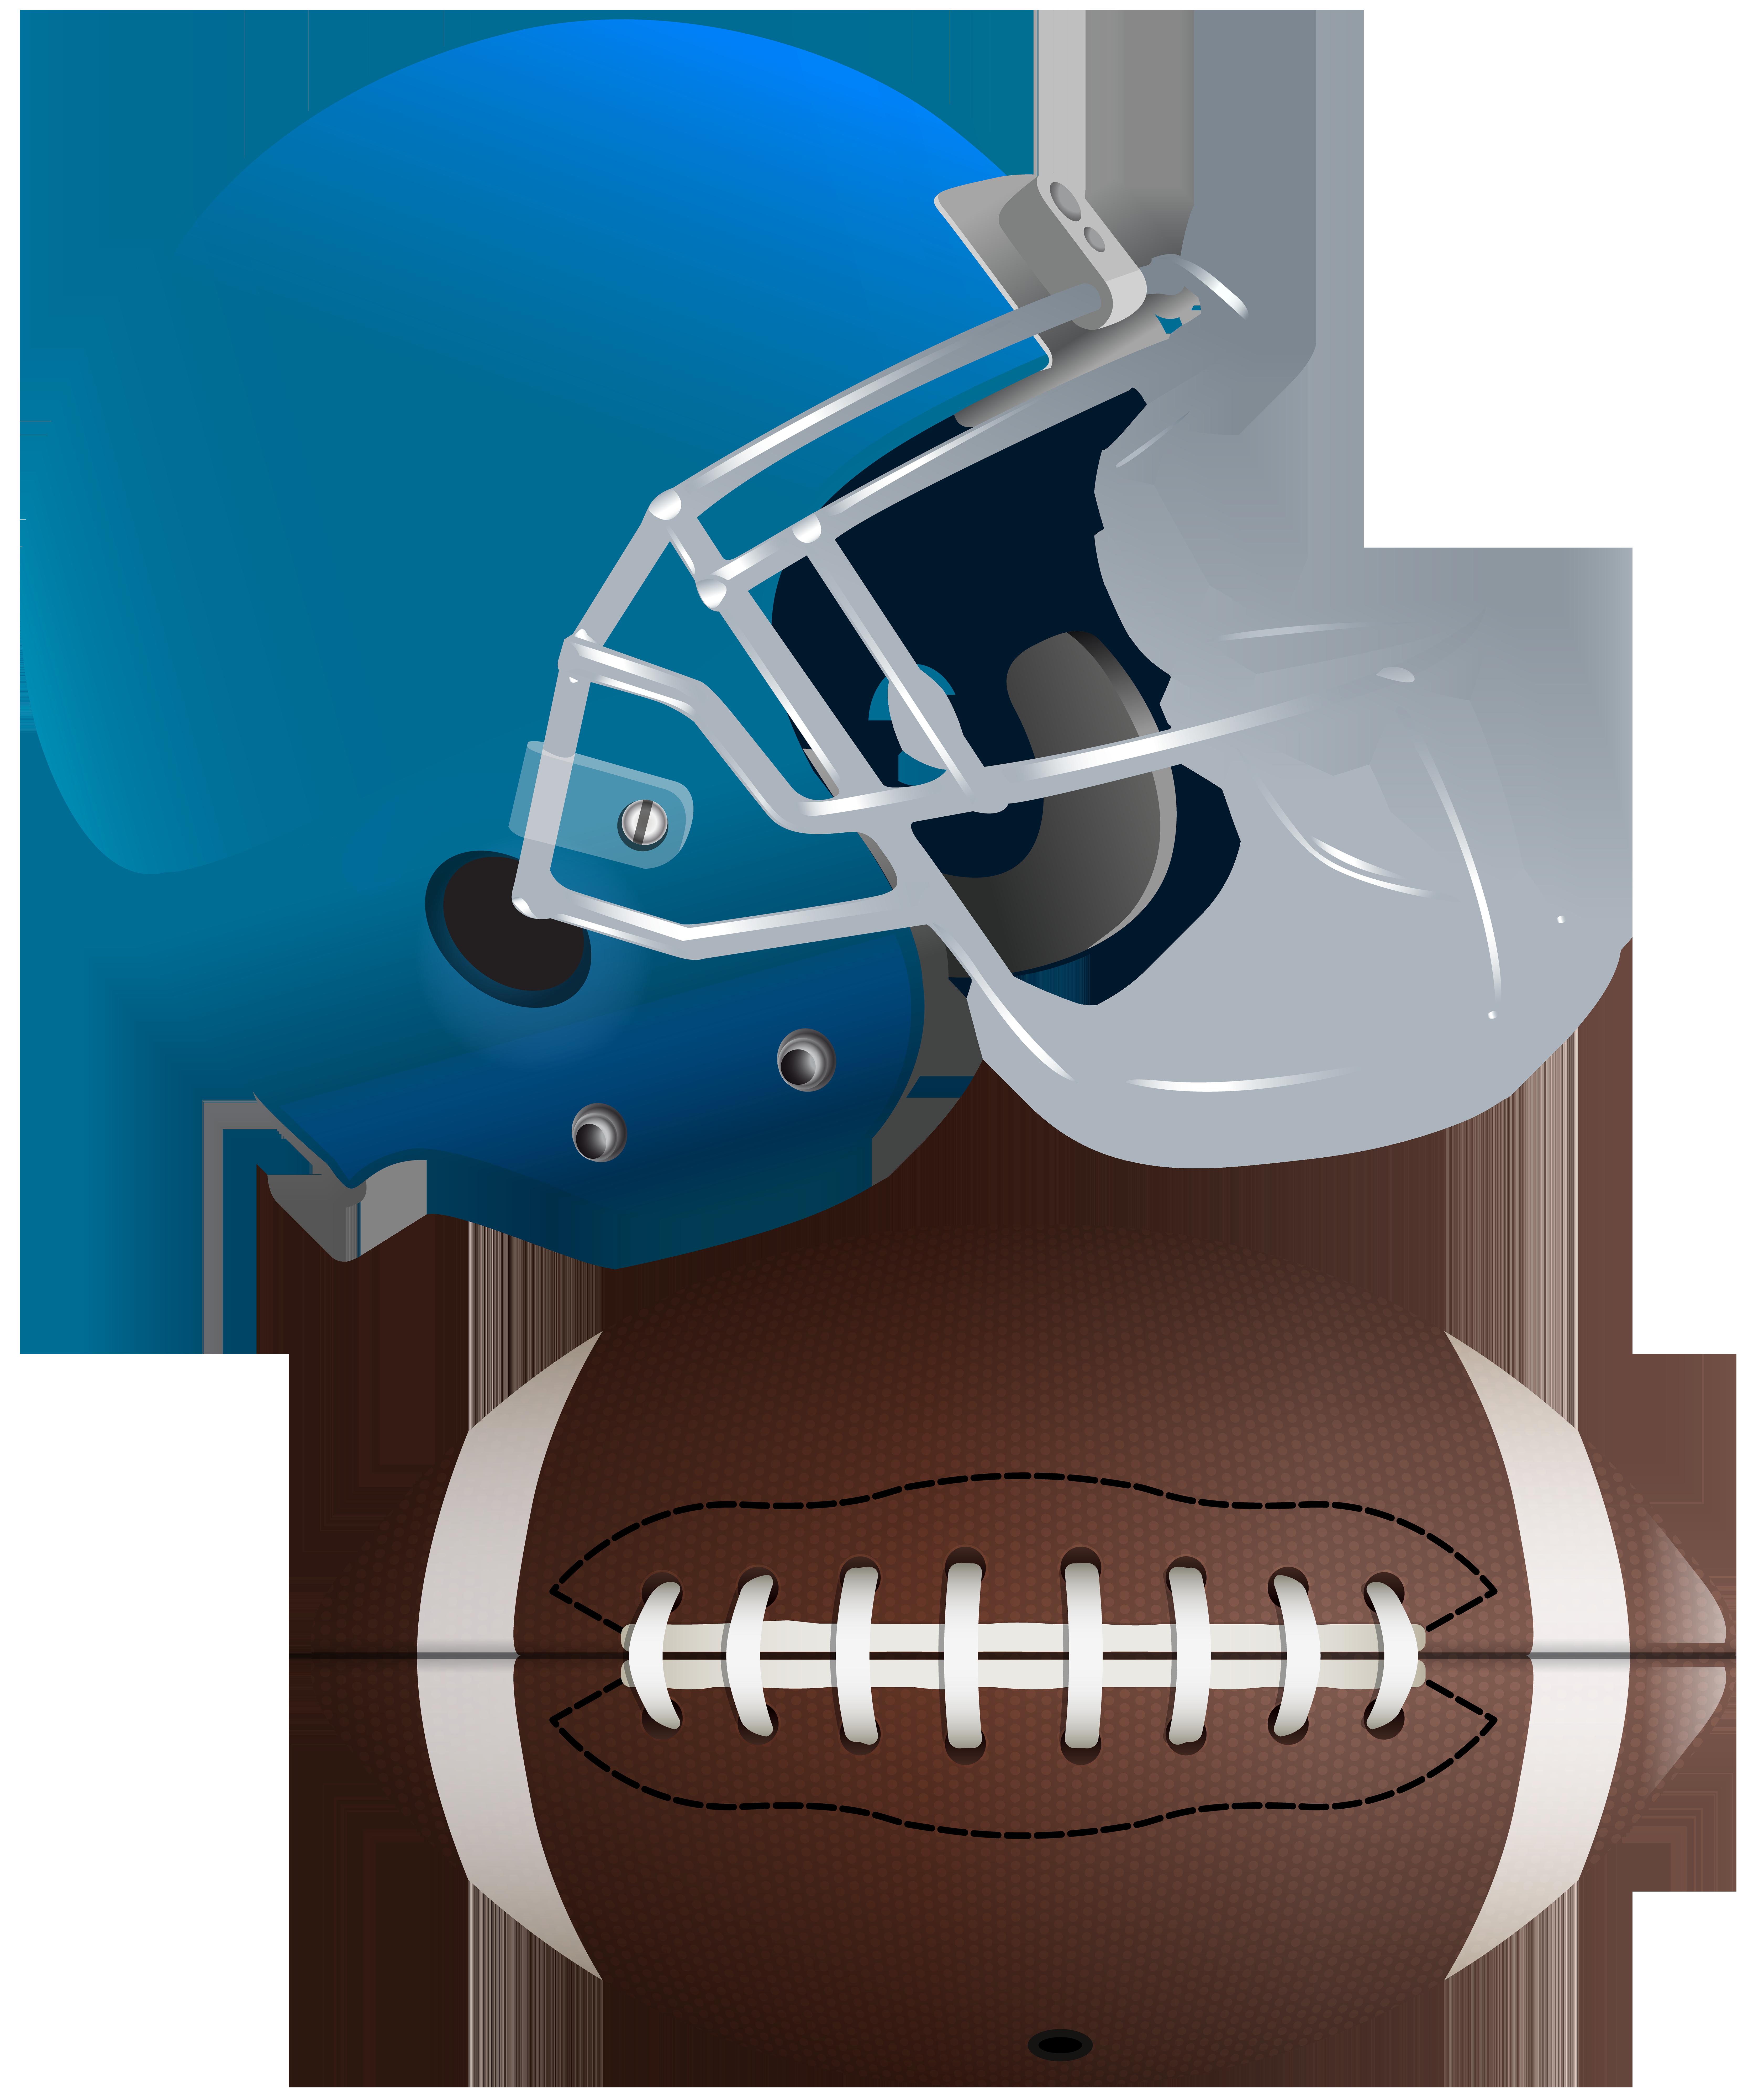 6702x8000 American Football Ball And Helmet Transparent Clip Art Image